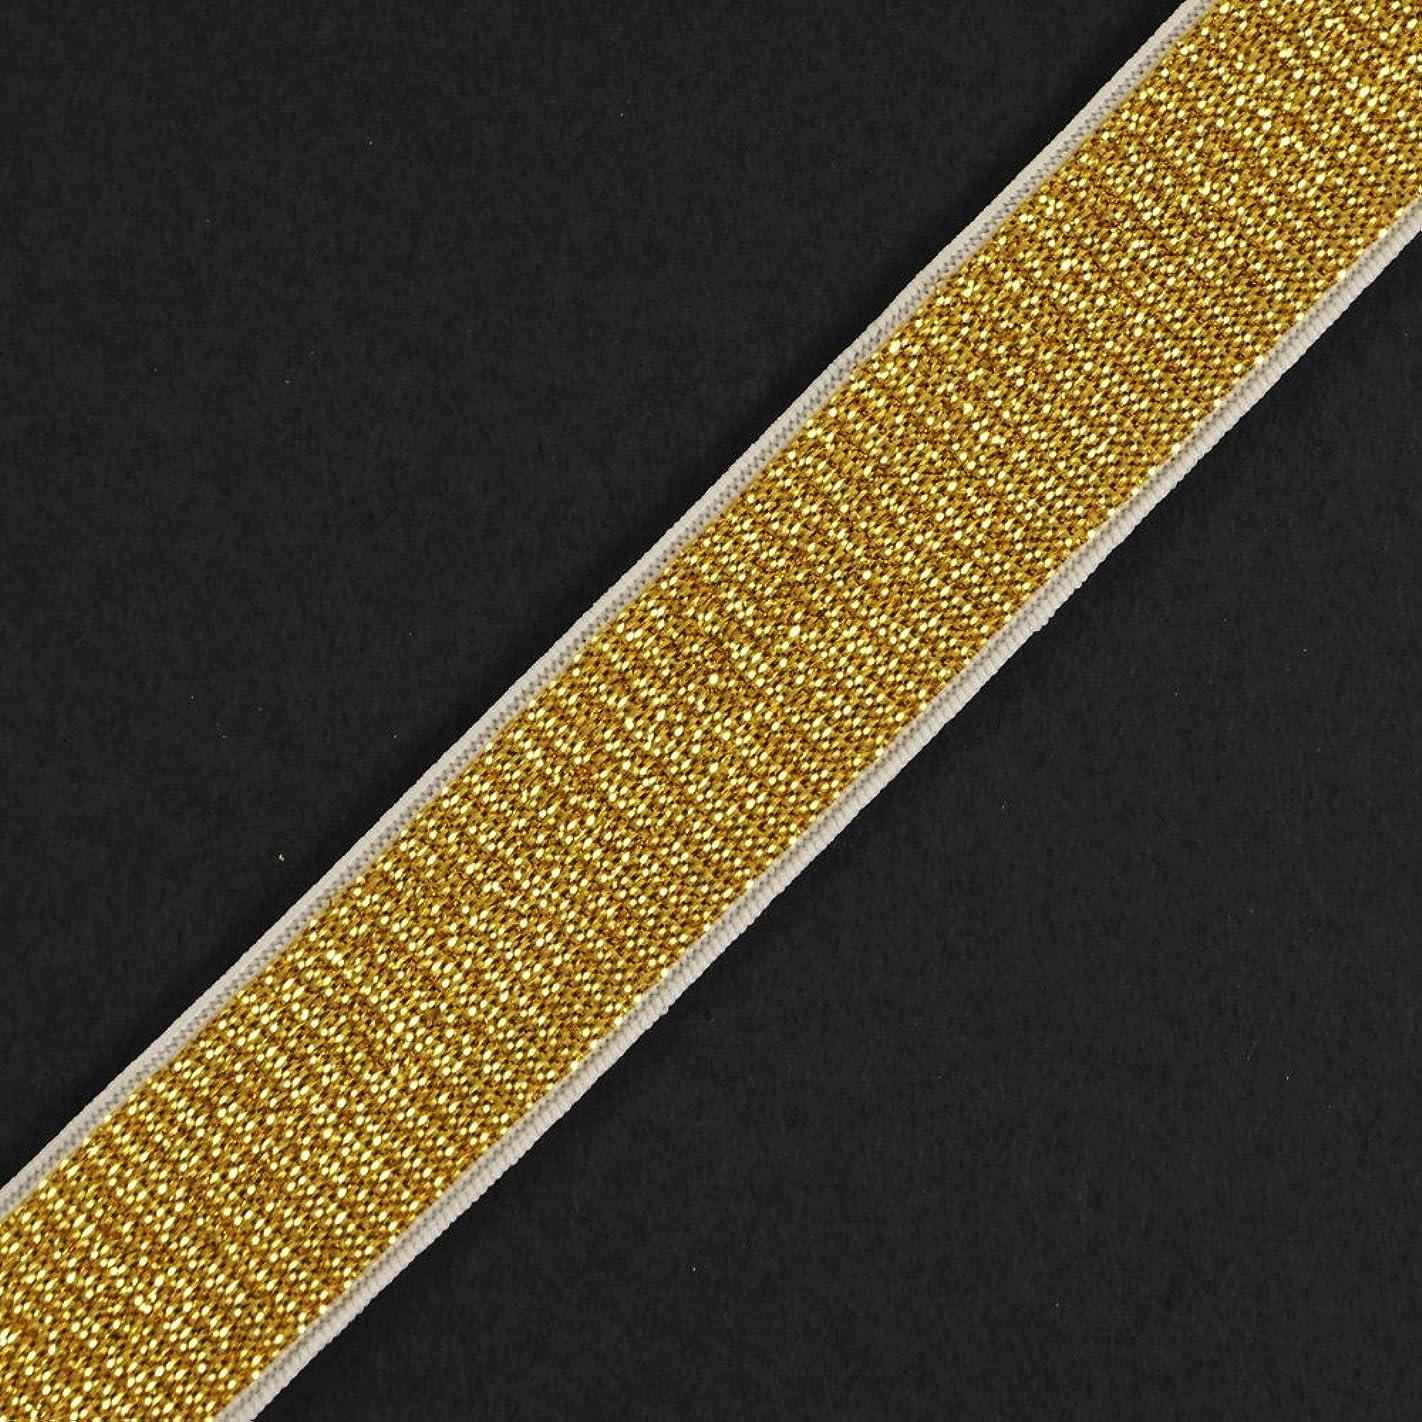 Trim 4-Yards 20mm (3/4'') Metallic Elastic Stretch Ribbon, Elastic Band, TR-11639 (Gold/White) r41741679490